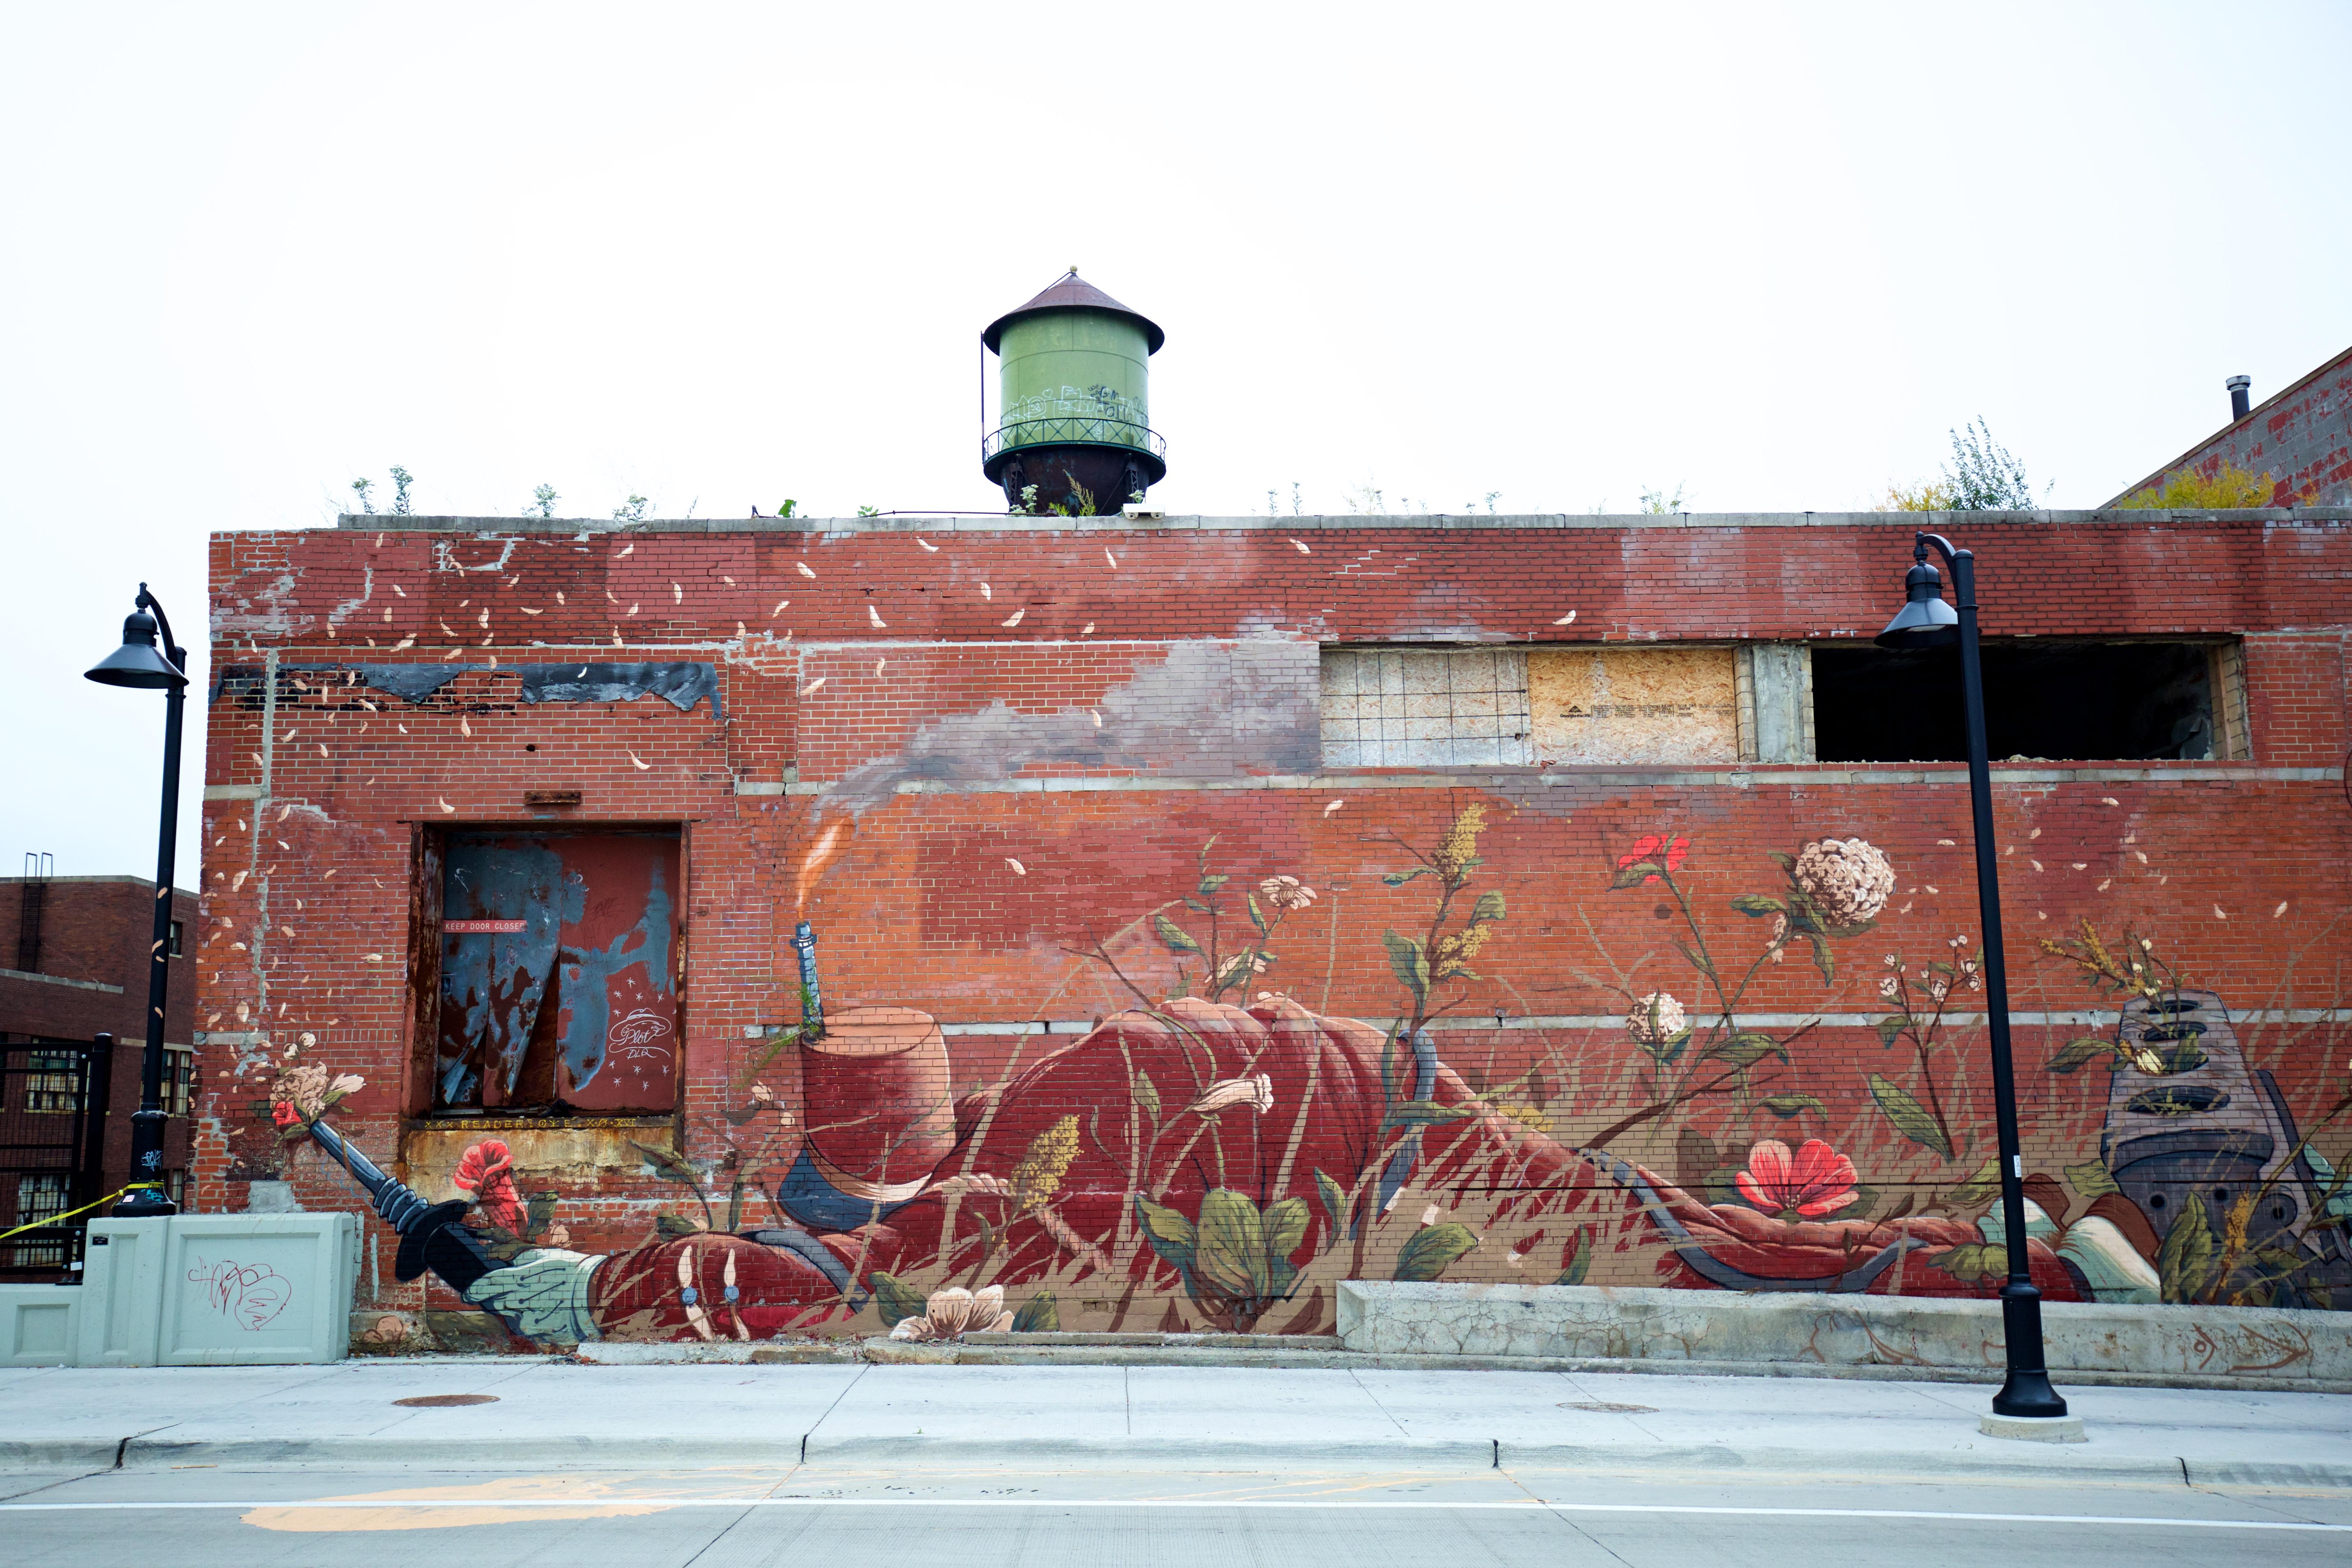 pat-perry_muralsinthemarket_1xrun_finished-walls-2